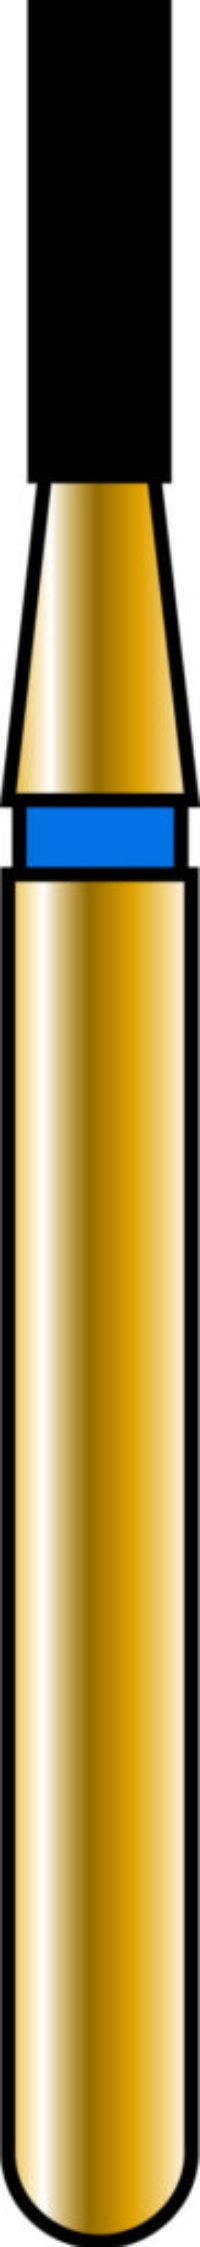 Flat End Cylinder 12-4mm Gold Diamond Bur